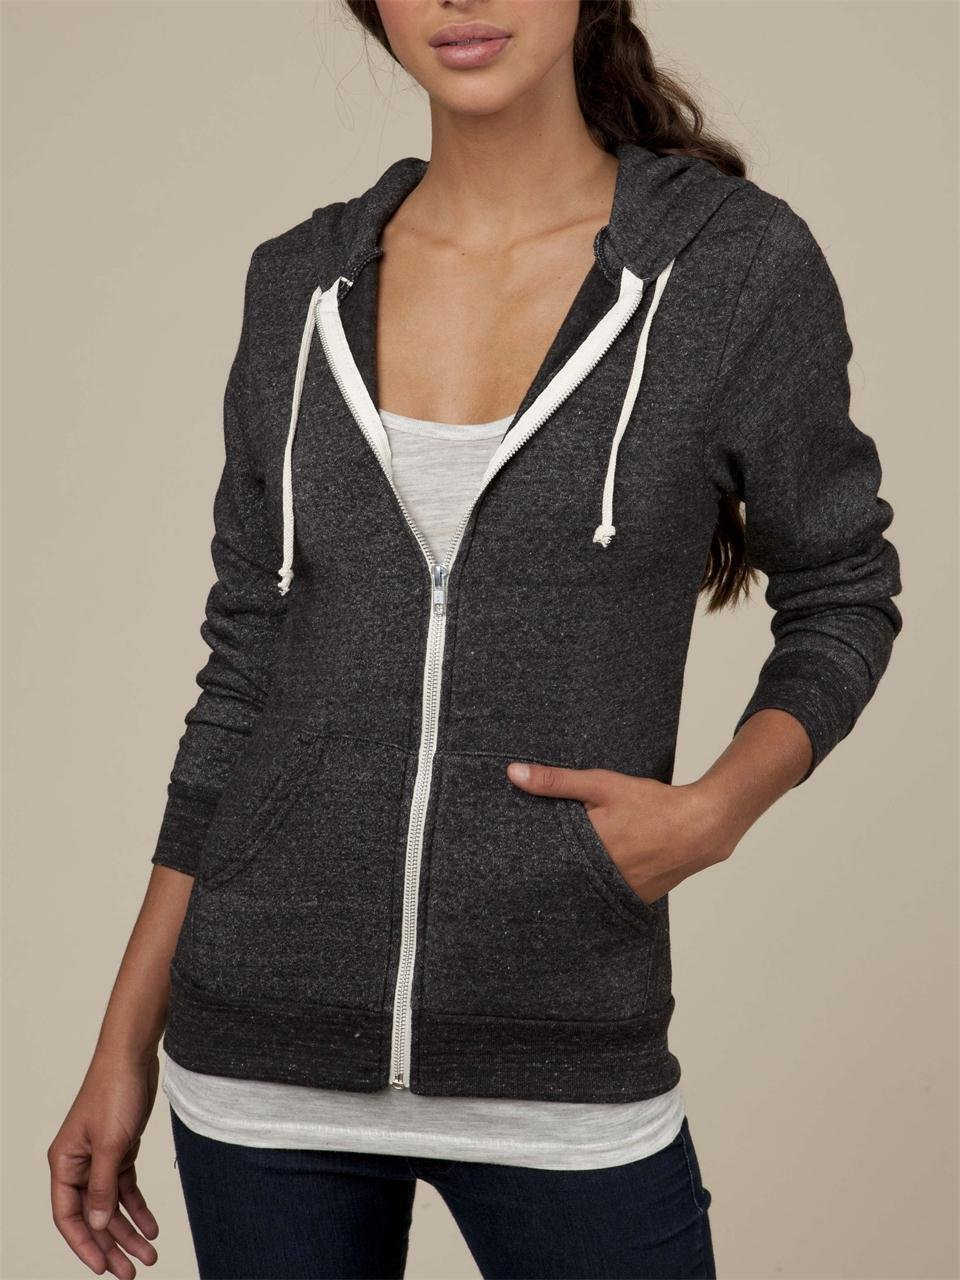 Soft Womens Sweatshirts Breeze Clothing